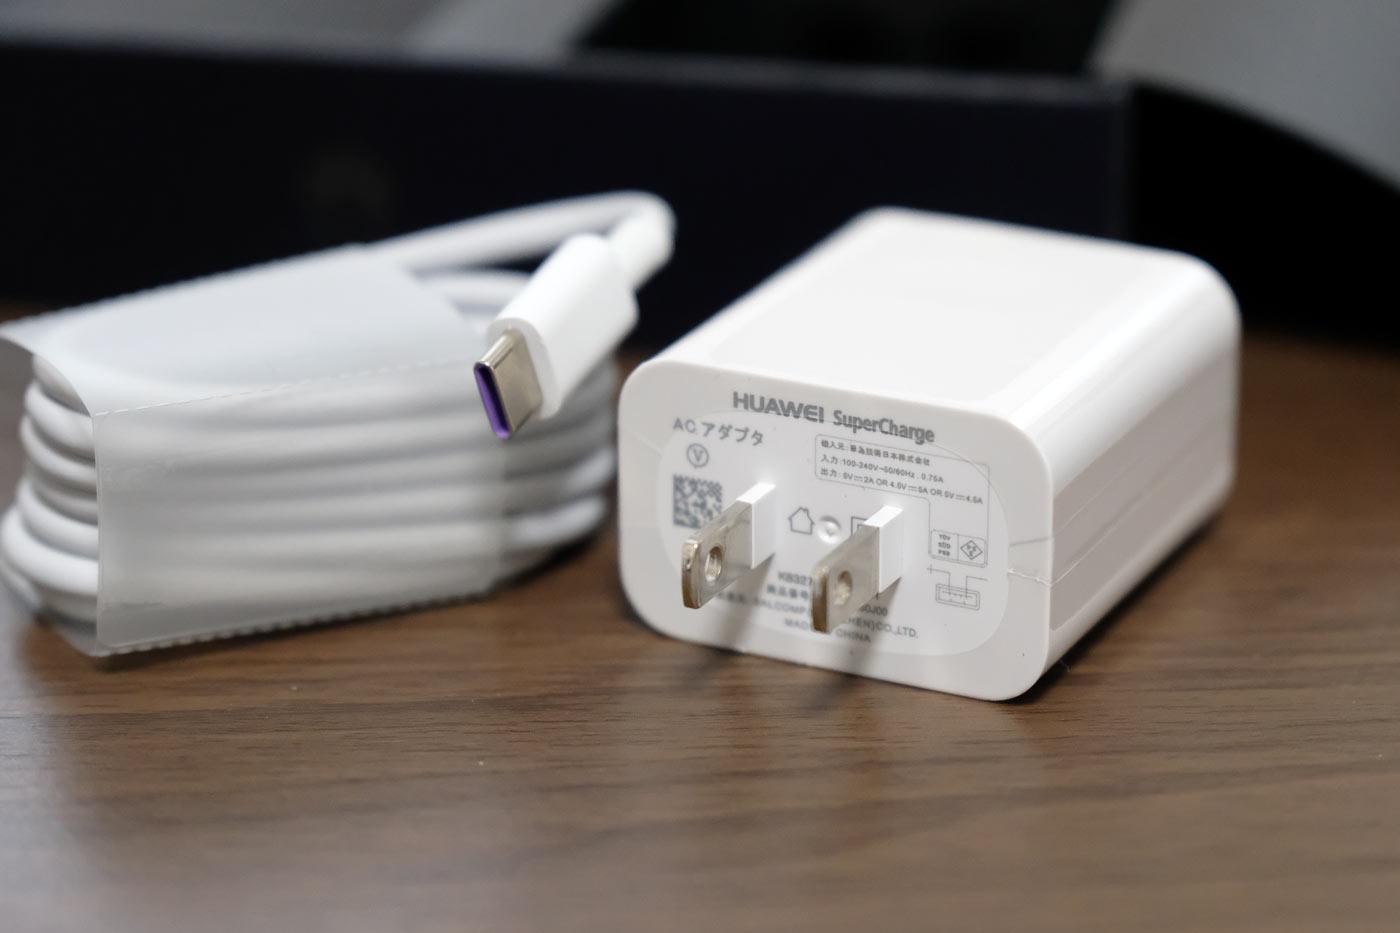 USB-Cケーブルと充電アダプタ